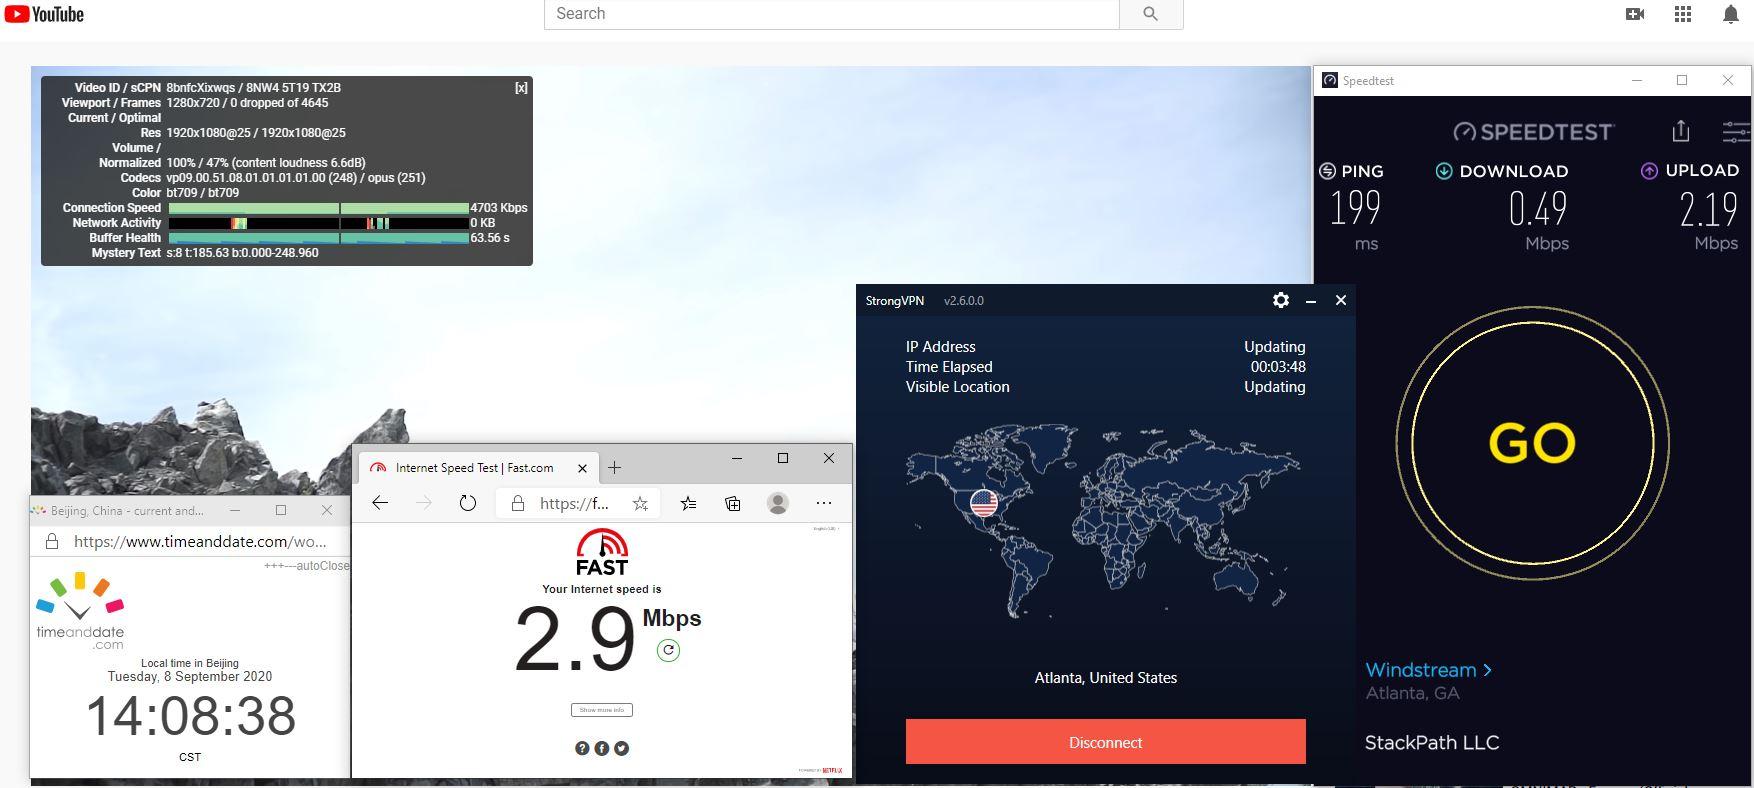 Windows10 StrongVPN USA - Atlanta 中国VPN 翻墙 科学上网 翻墙速度测试 - 20200908